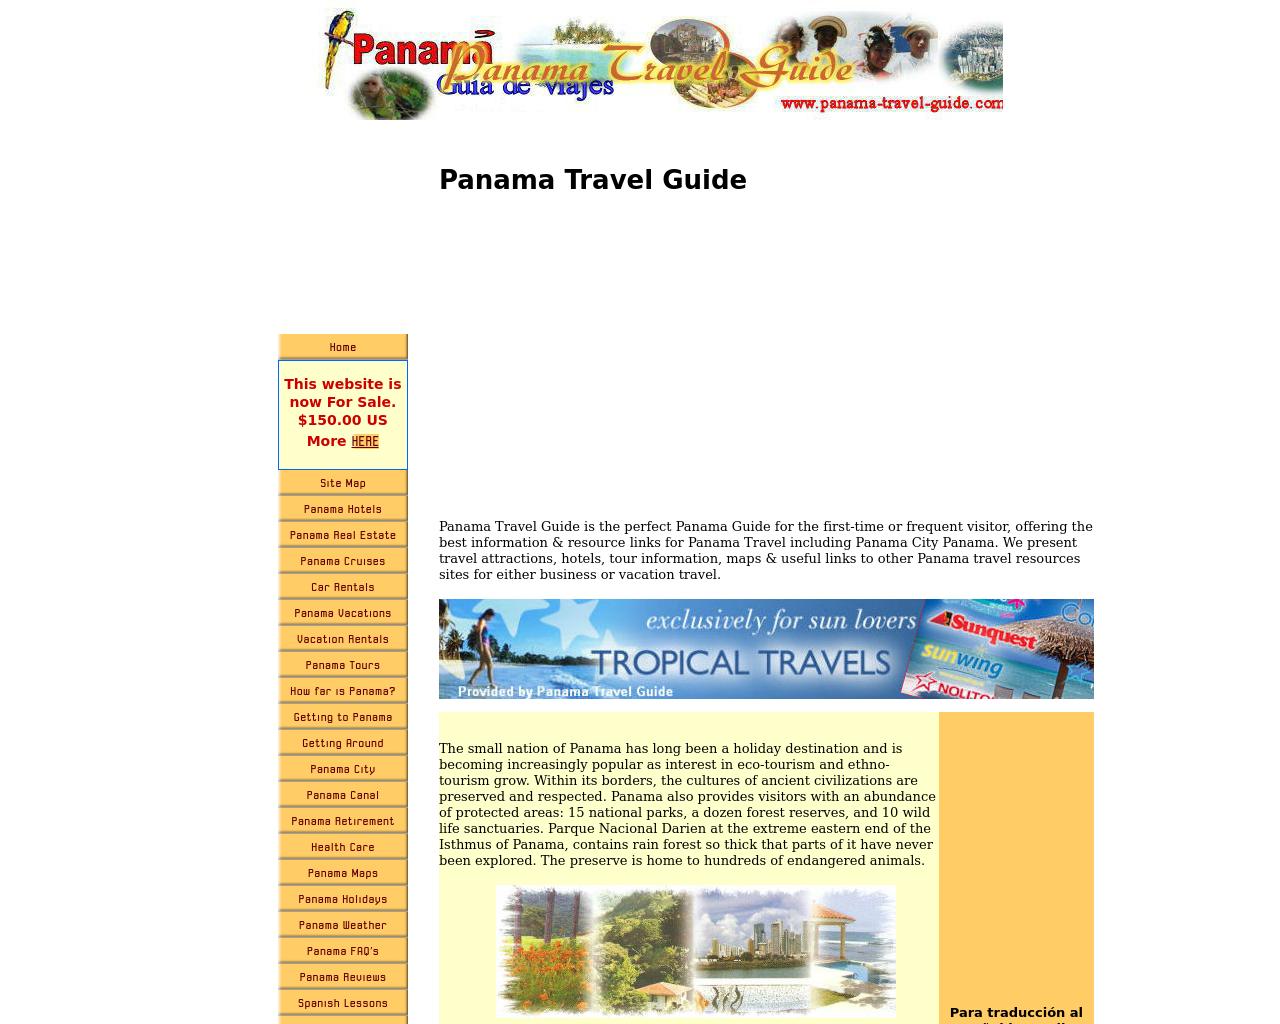 Panama-Travel-Guide-Advertising-Reviews-Pricing